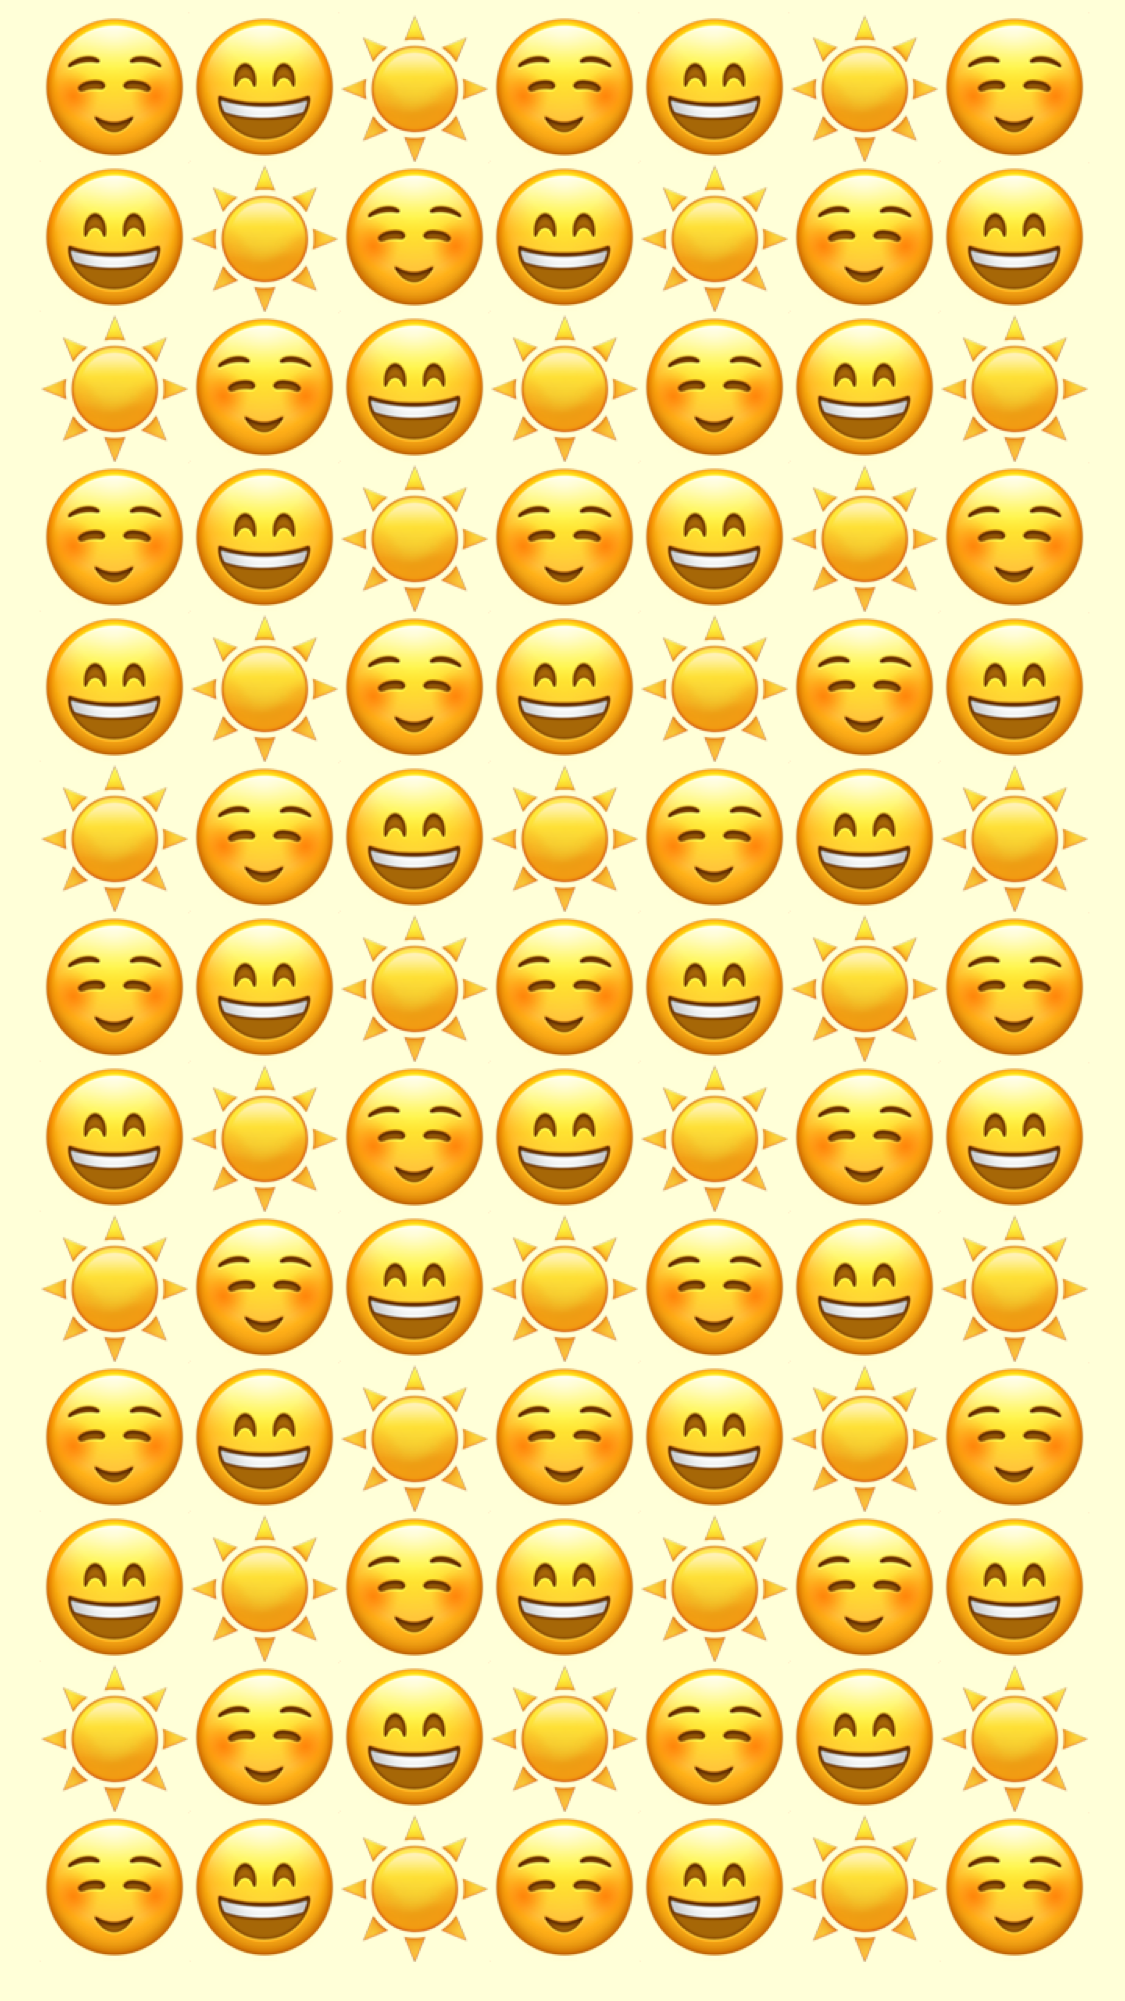 Wallpaper Iphone Sunny Whatsapp Yellow Happy Emoji Wallpaper Marble Iphone Wallpaper Emoji Backgrounds